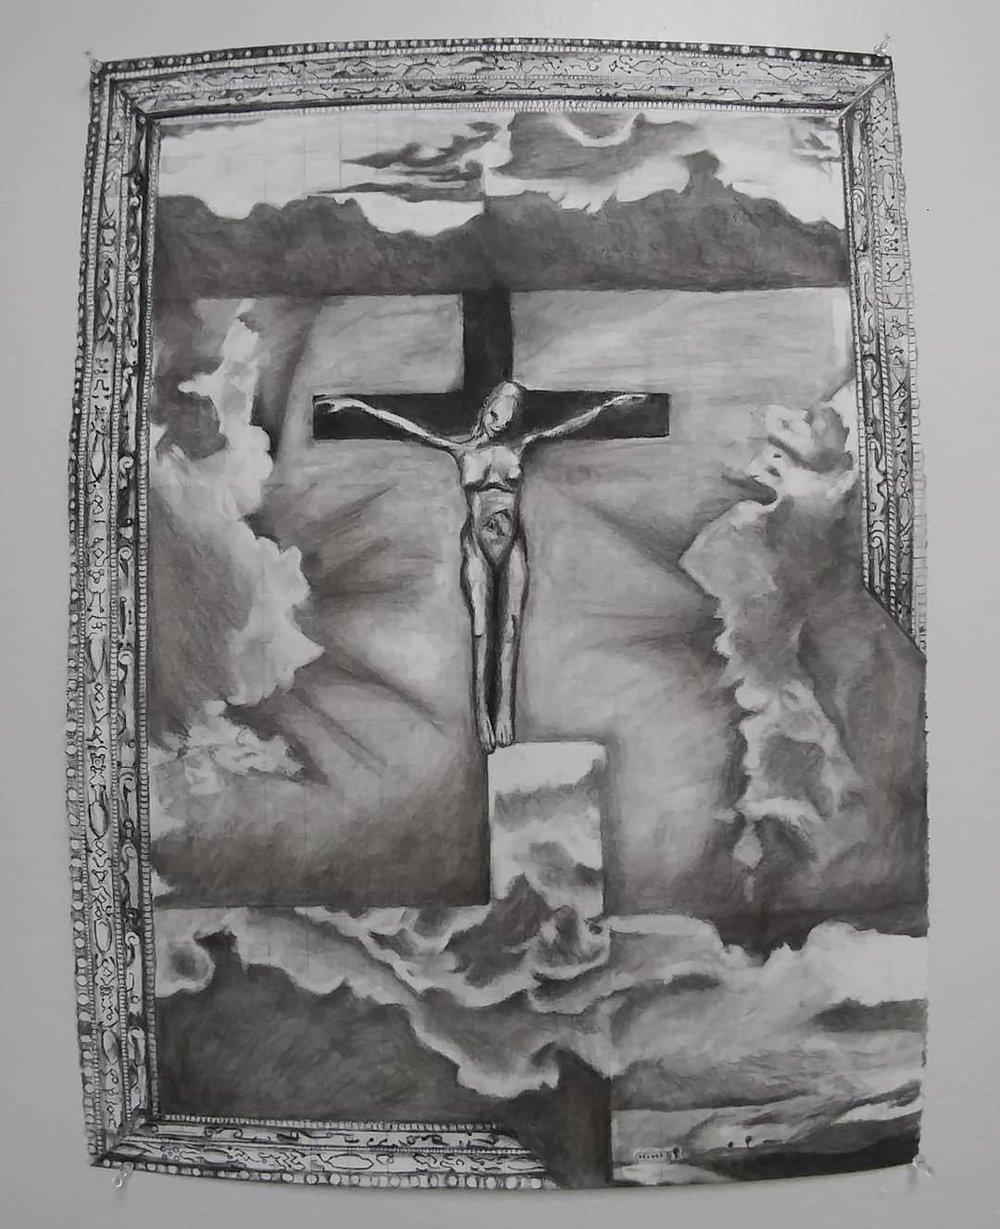 Chistine on the Cross - Phyciatrist